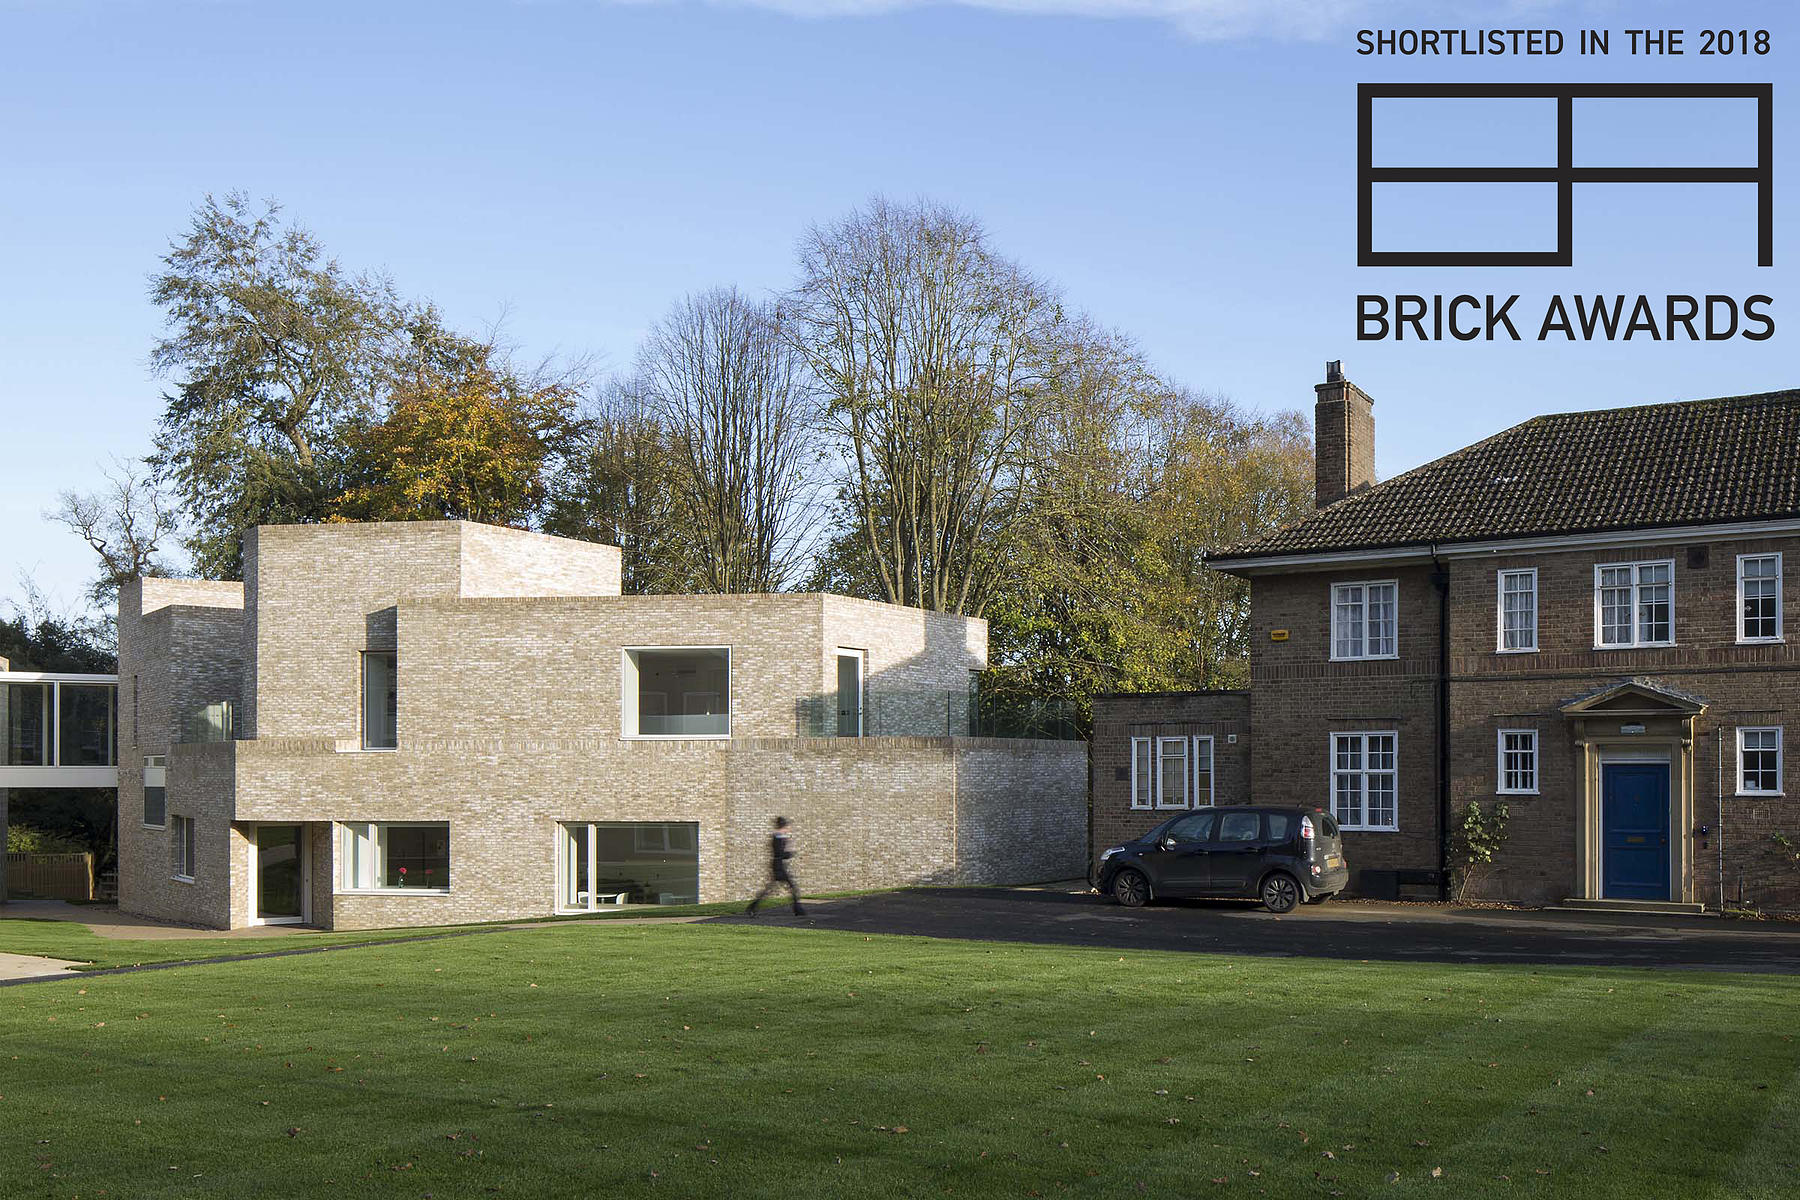 Mica u west house shortlisted for brick award